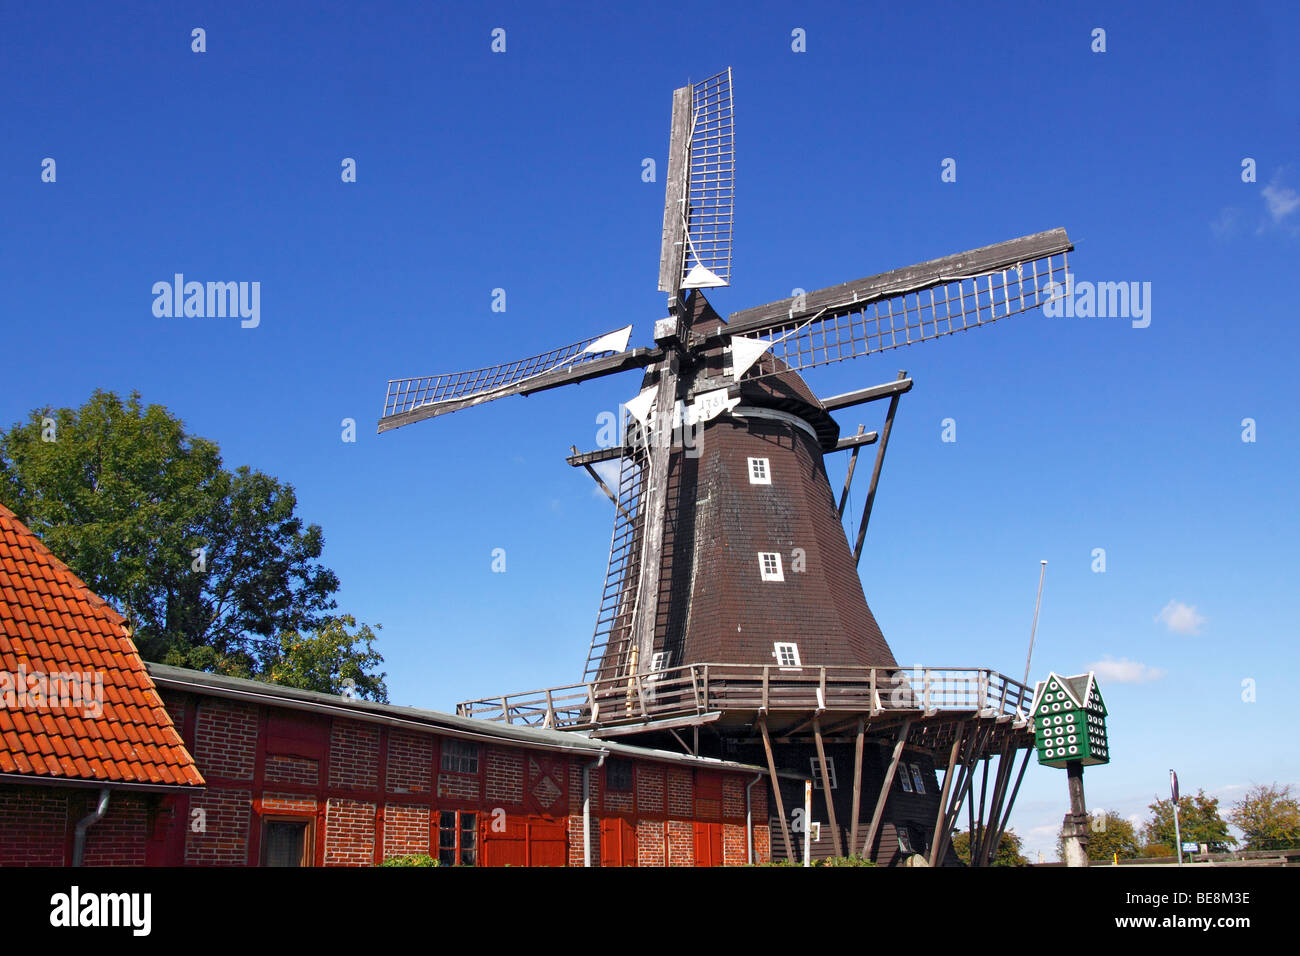 Old windmill, Windmill Museum in Lemkenhafen, Fehmarn Island, Baltic Sea island, Ostholstein district, Schleswig - Stock Image